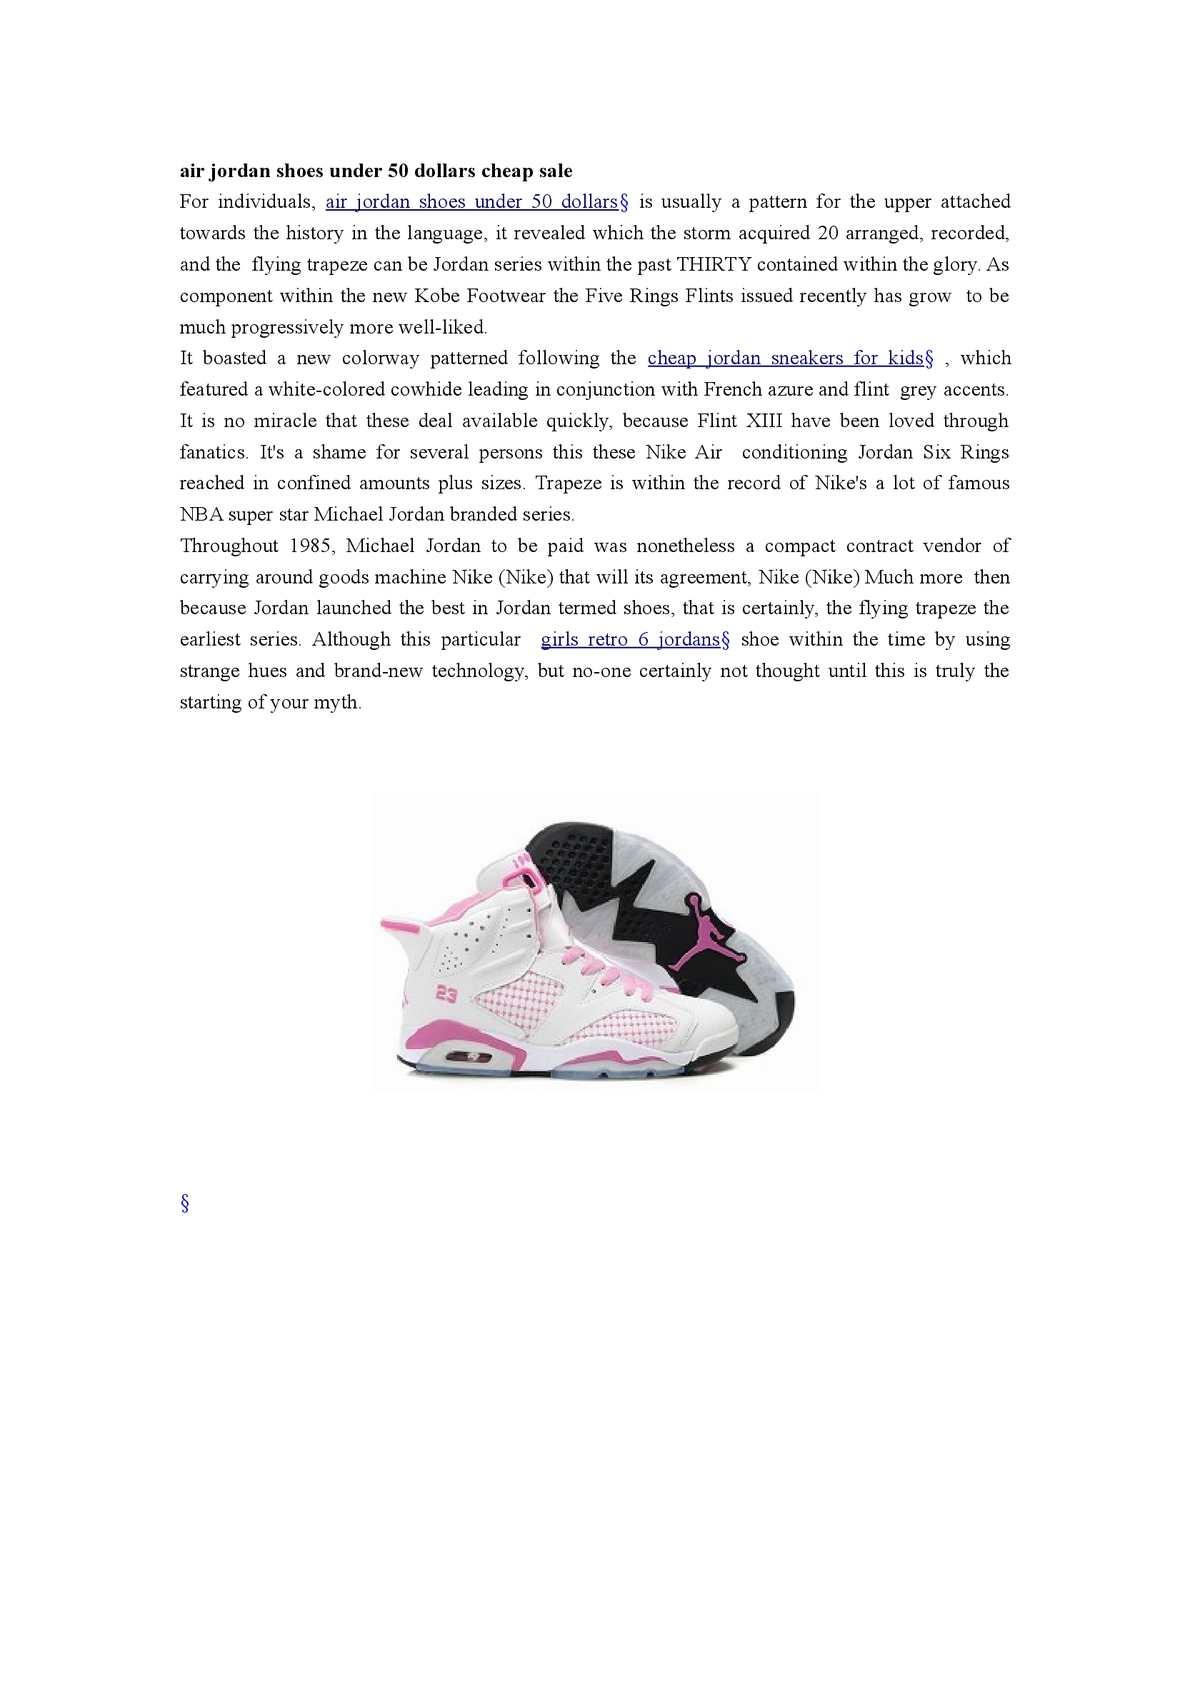 Calaméo - air jordan shoes under 50 dollars cheap sale